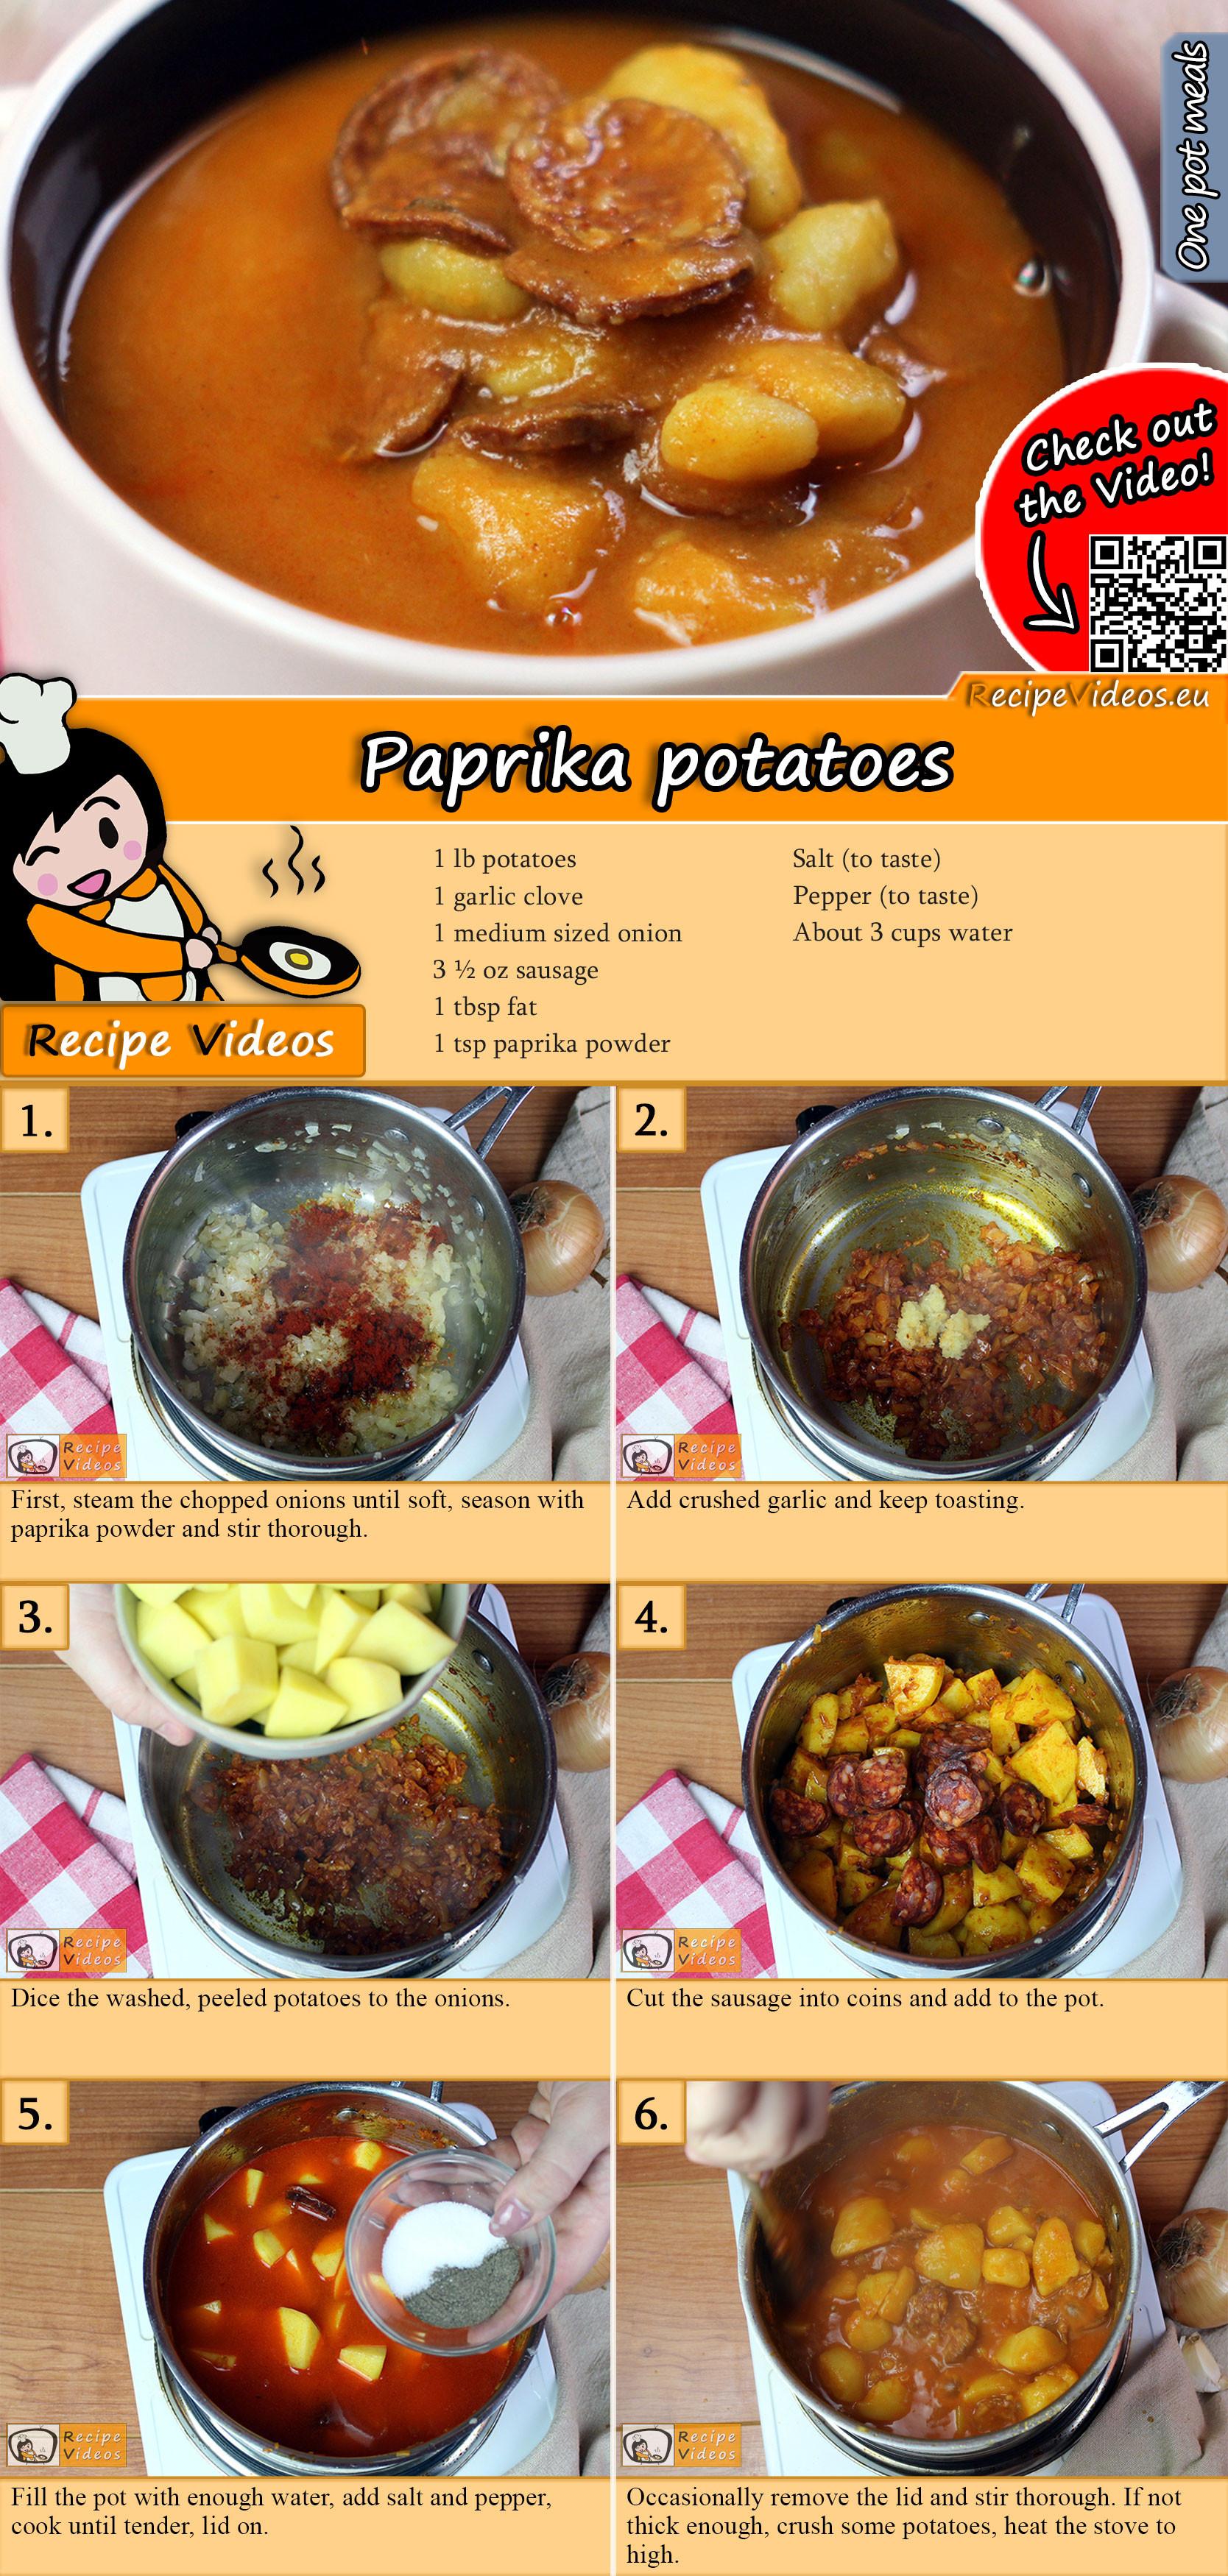 Paprika potatoes recipe with video